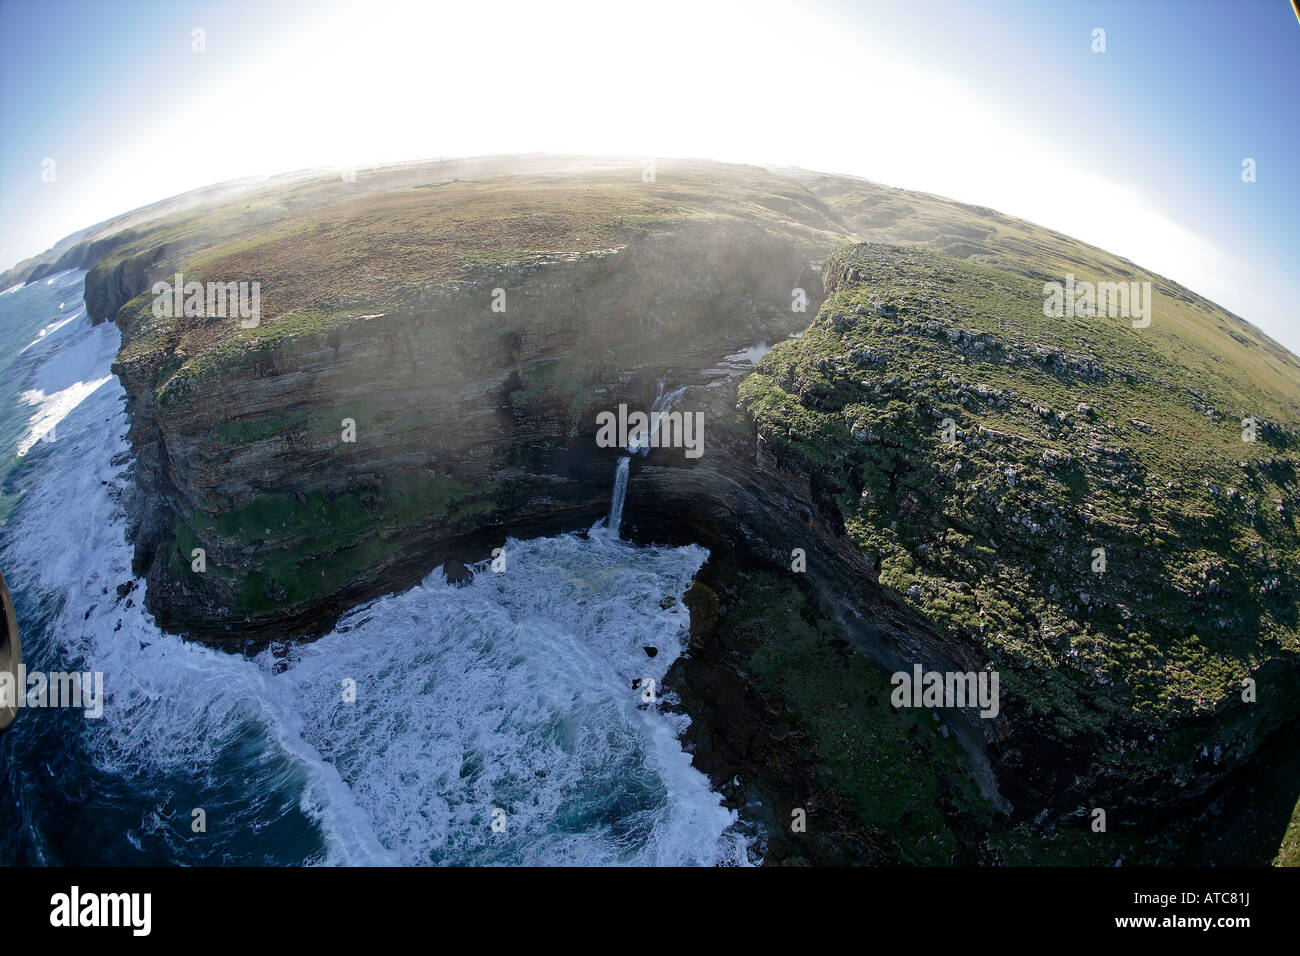 Vista aérea de la arenisca del litoral de la costa salvaje de Transkei Sureste de África Océano Índico Imagen De Stock